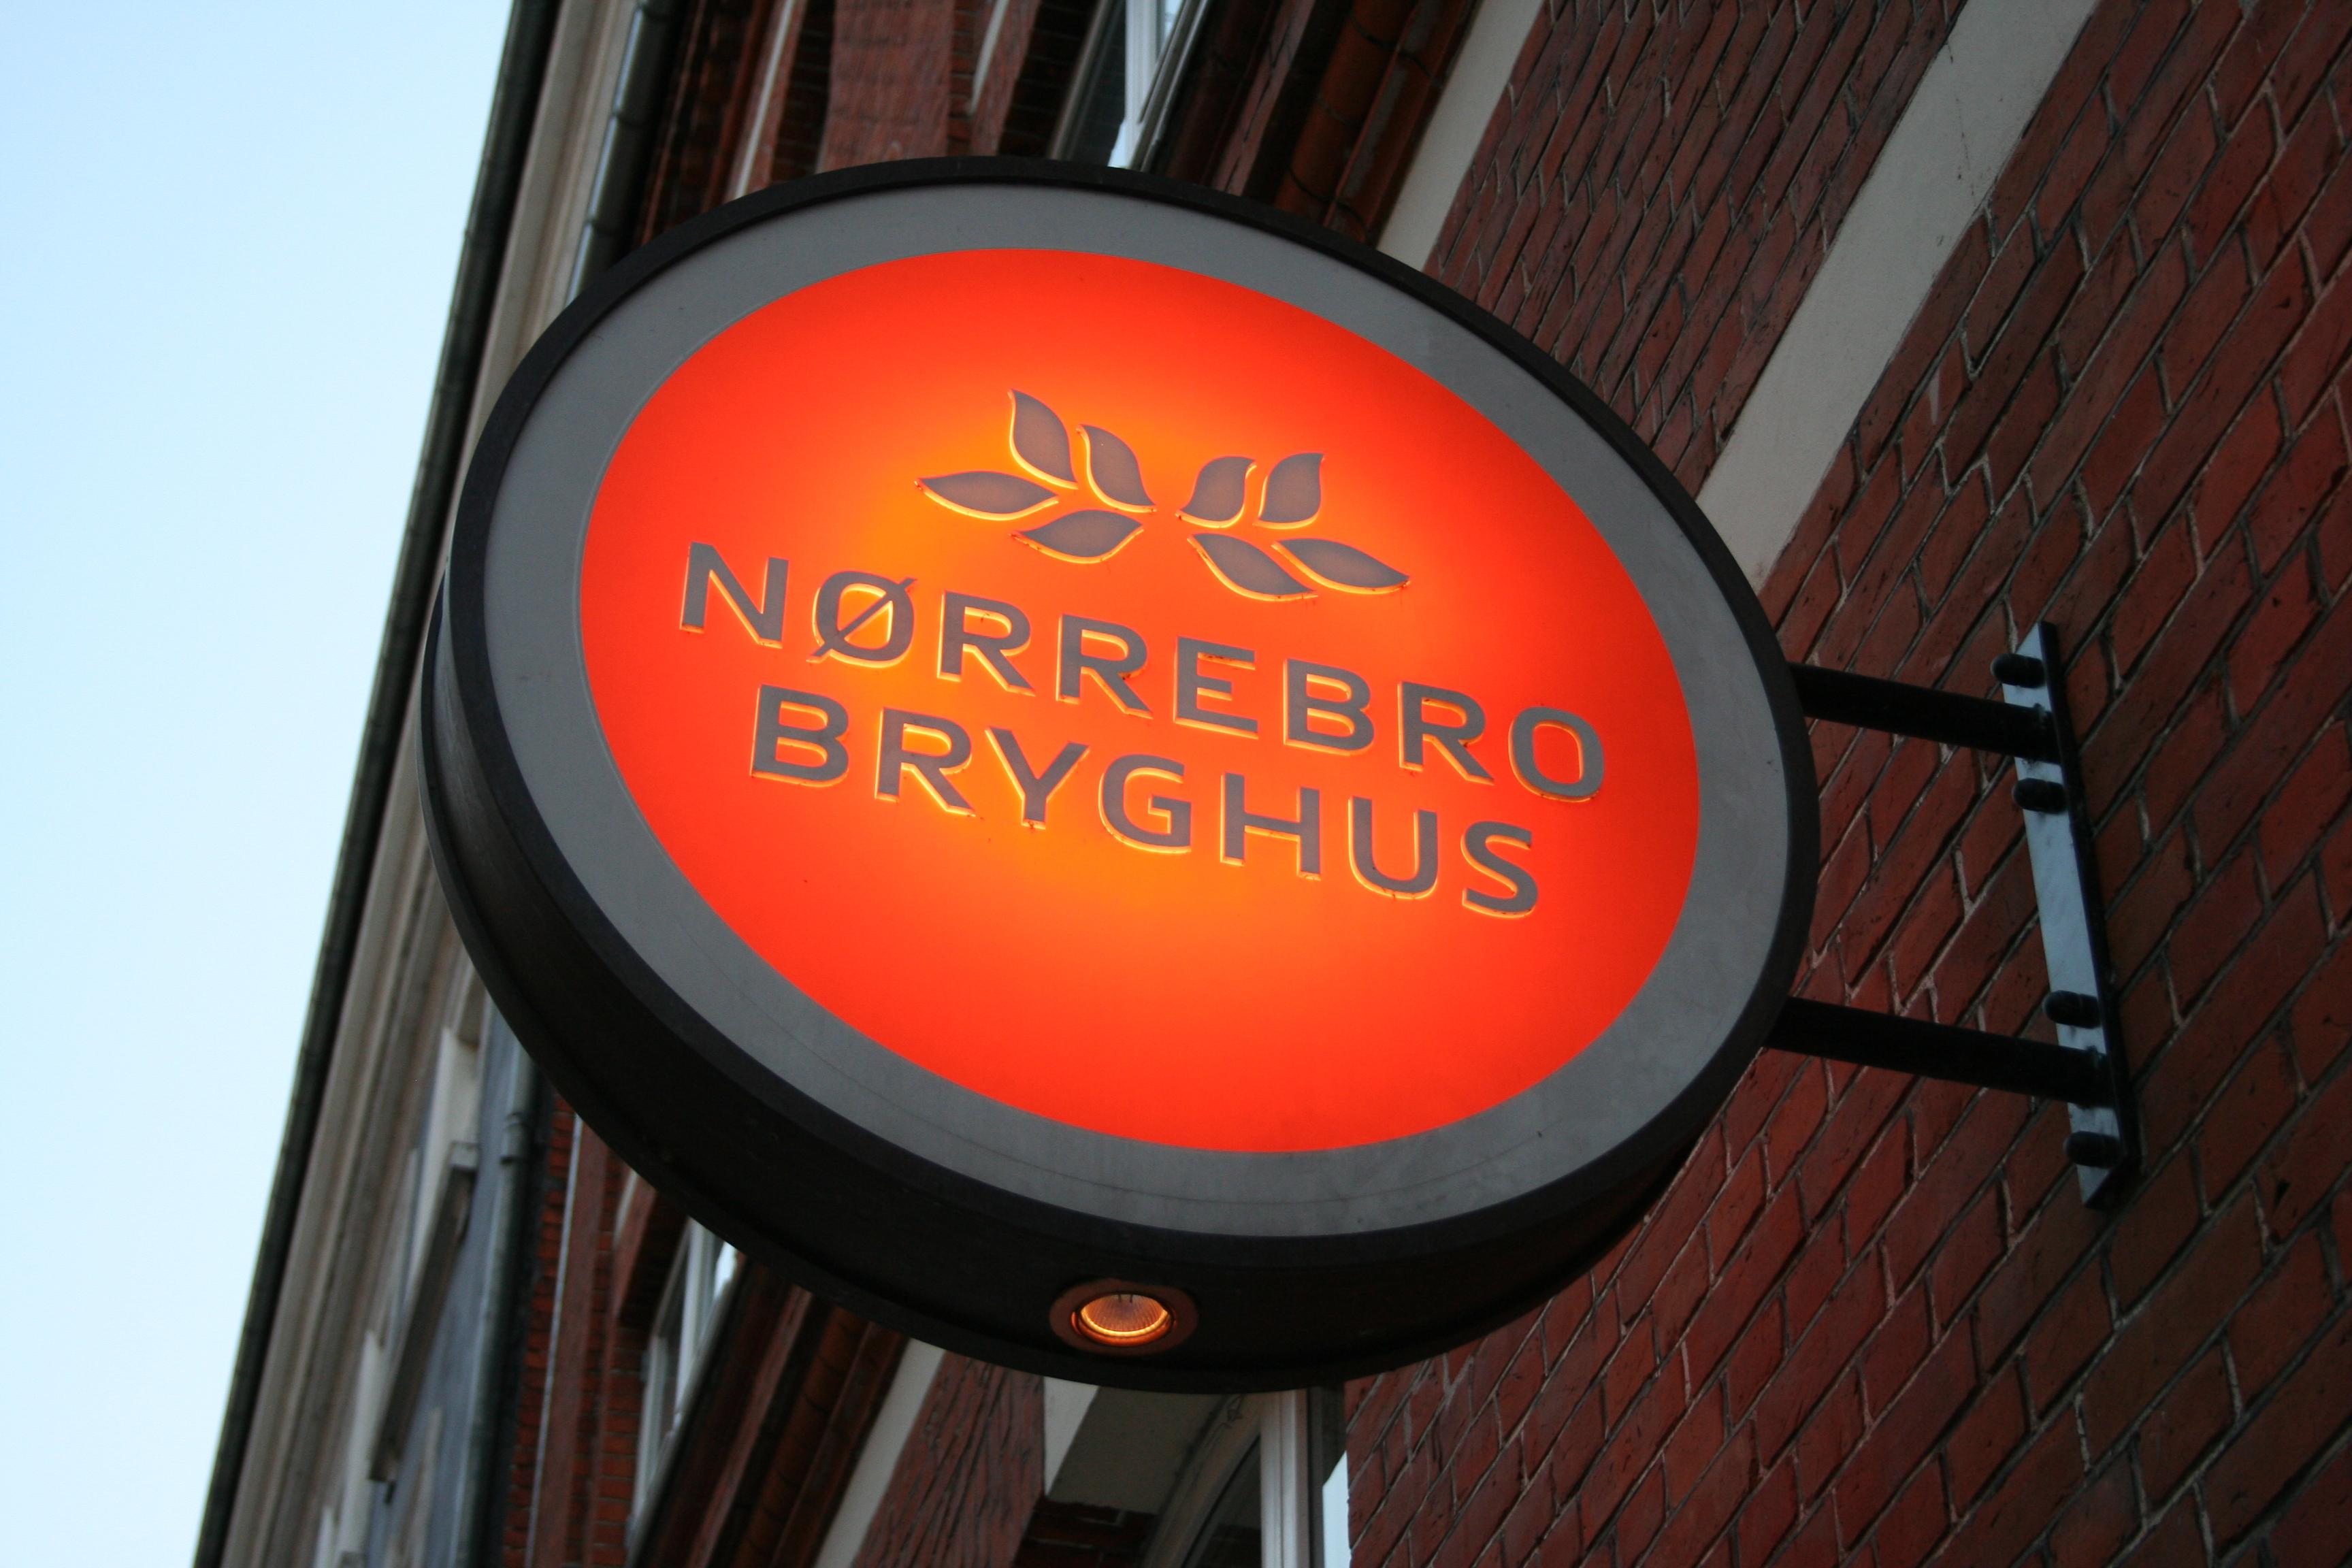 Nørrebro_Bryghus